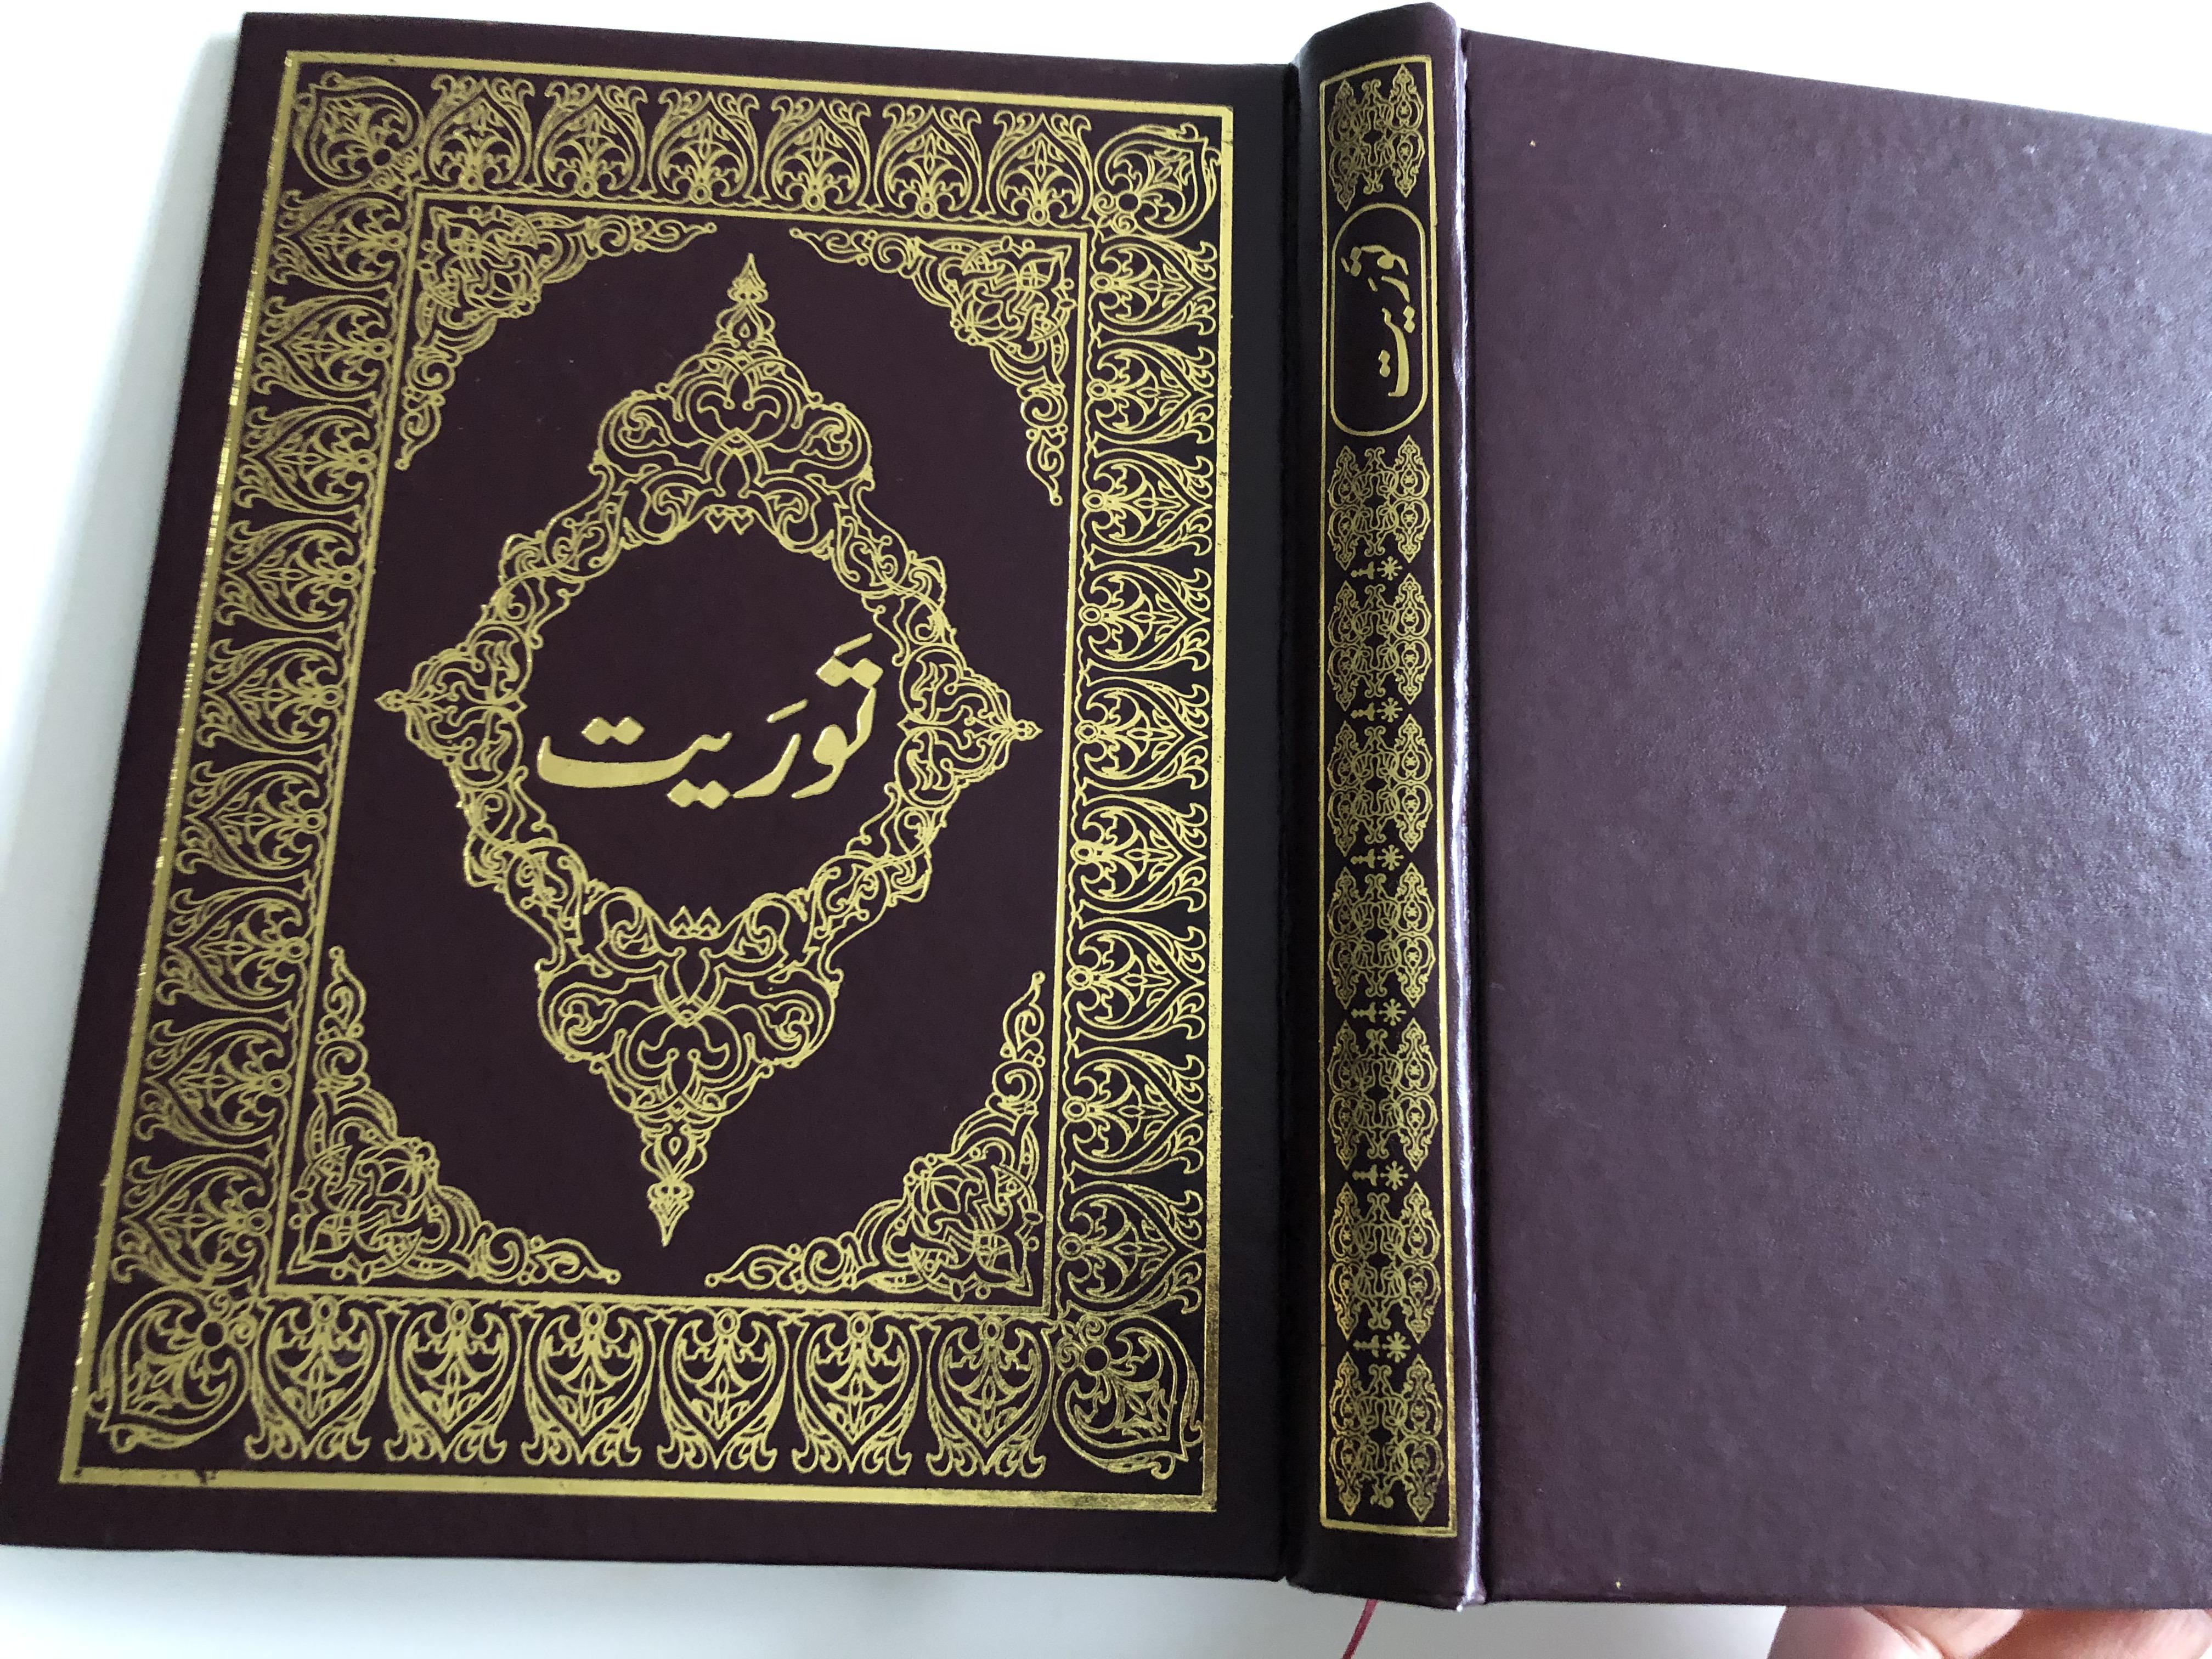 pentateuch-in-urdu-language-torah-hardcover-2018-10-.jpg